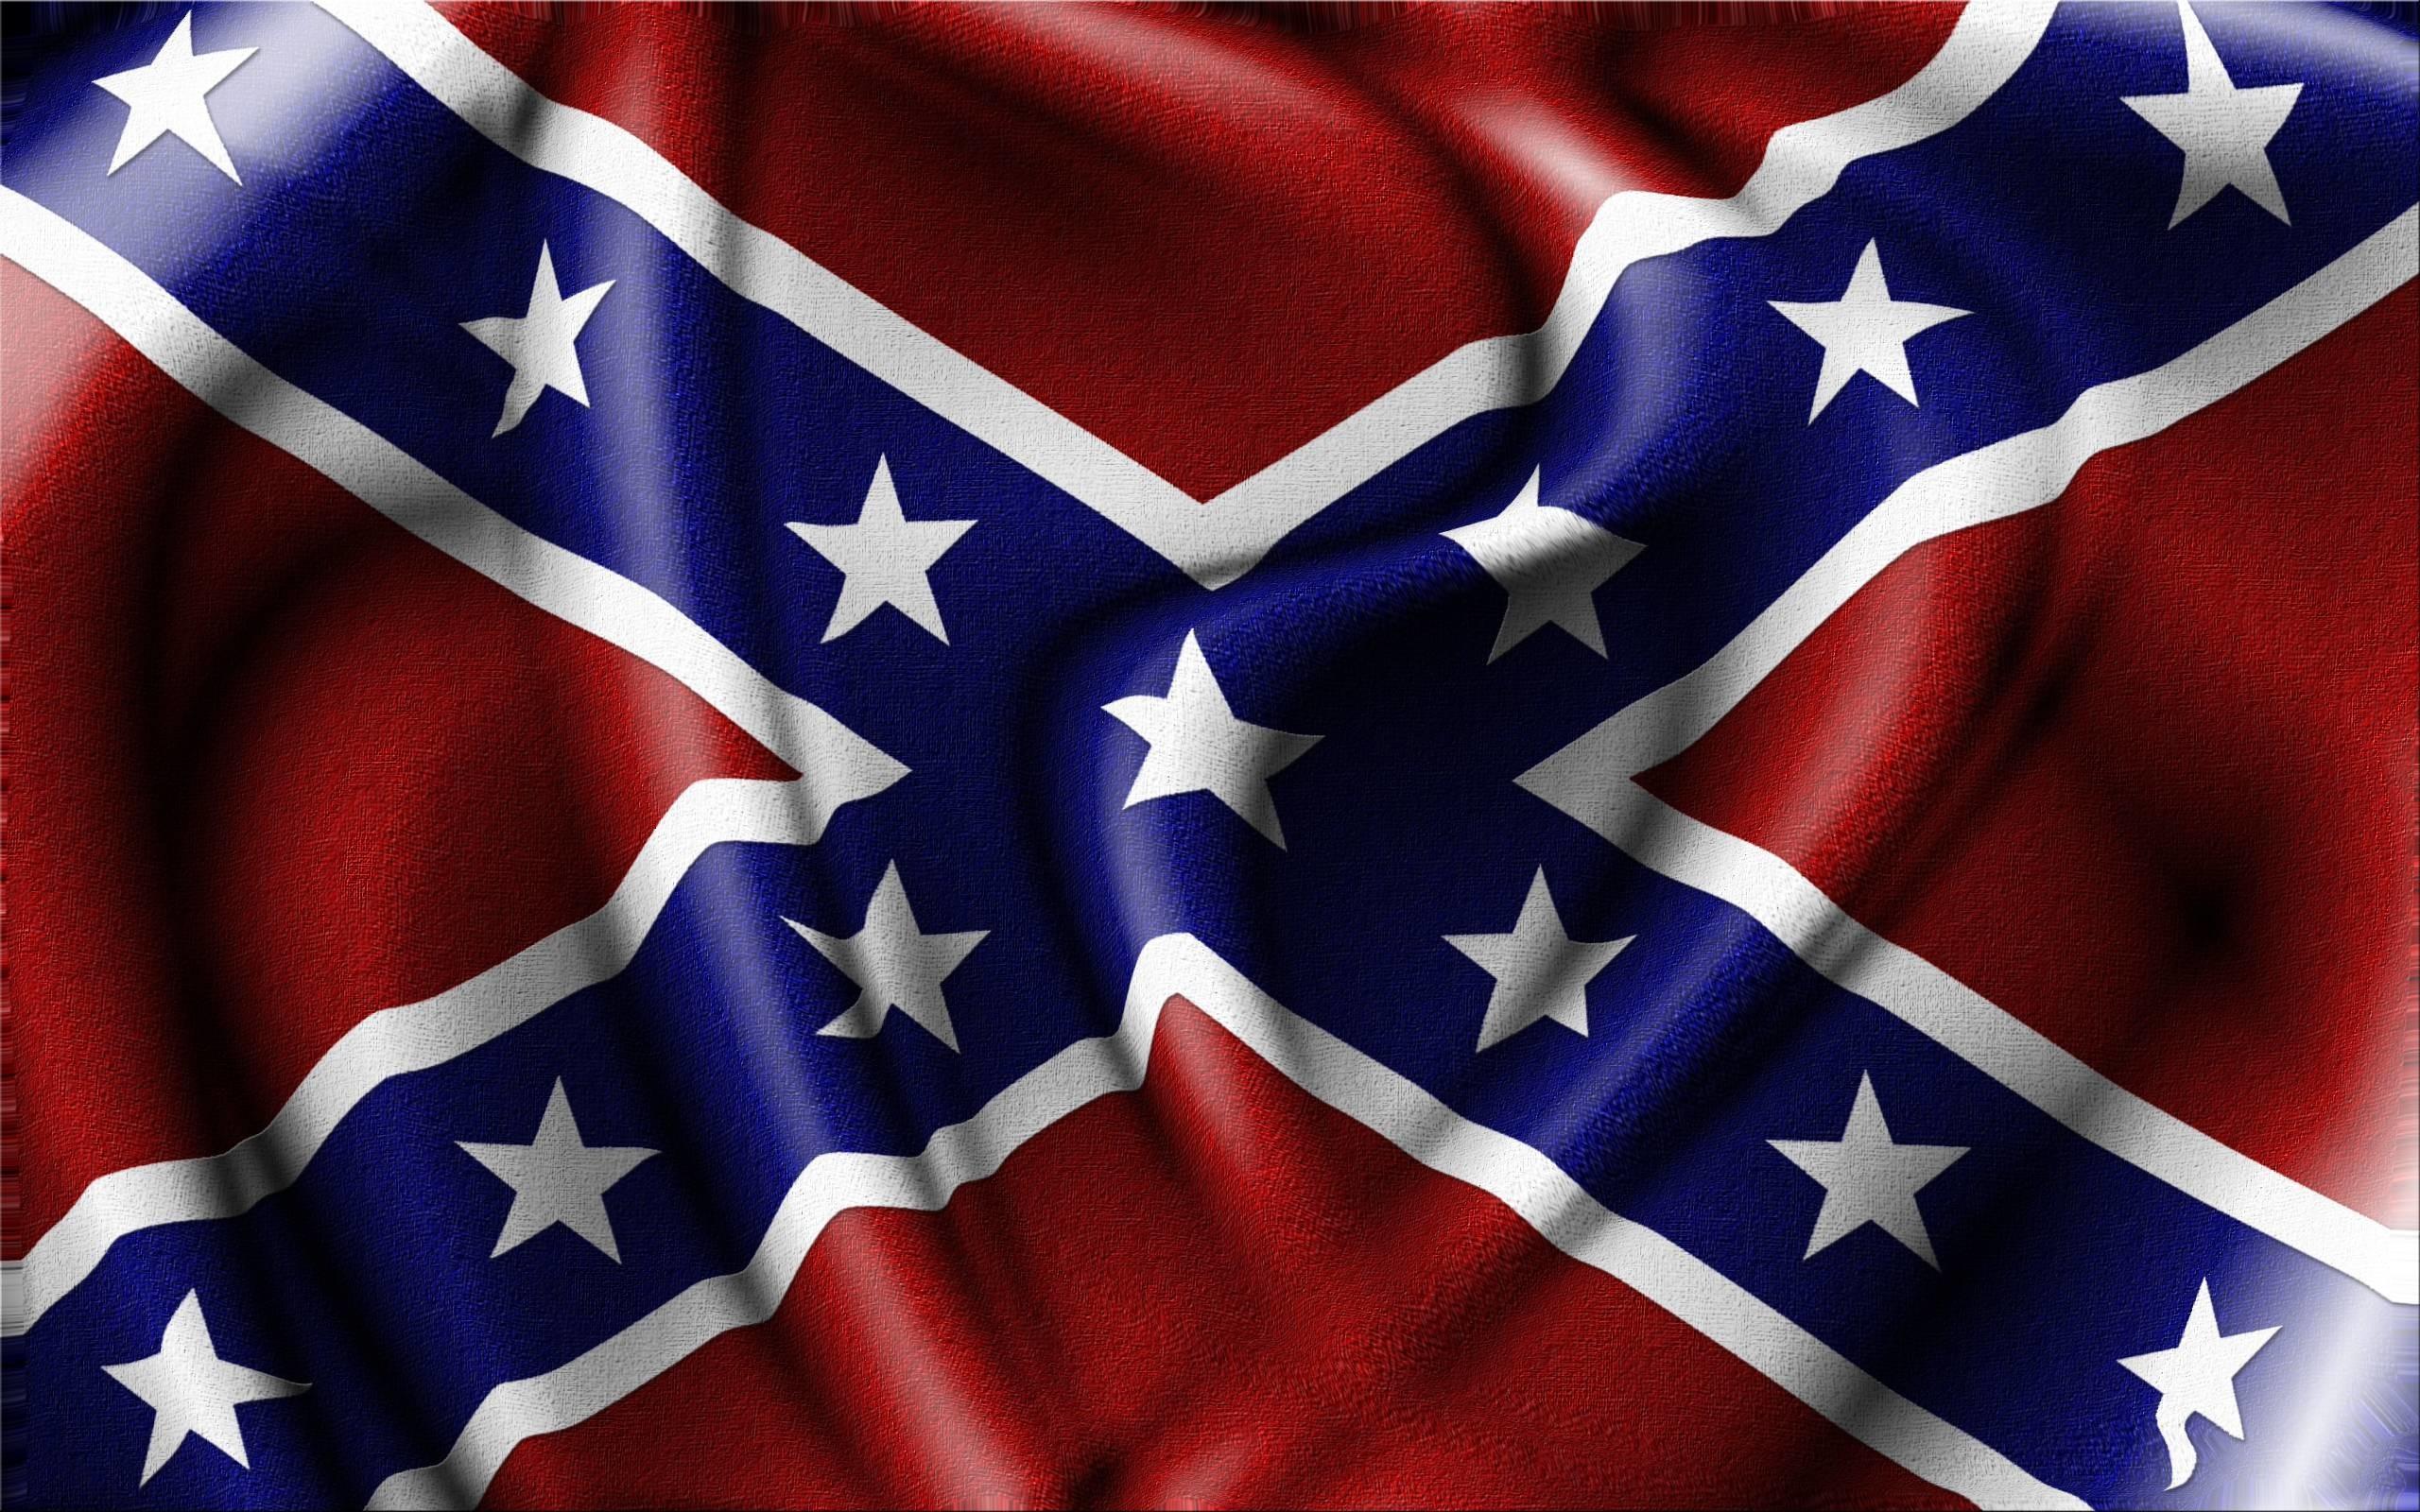 Confederate Flag Wallpaper | Large HD Wallpaper Database